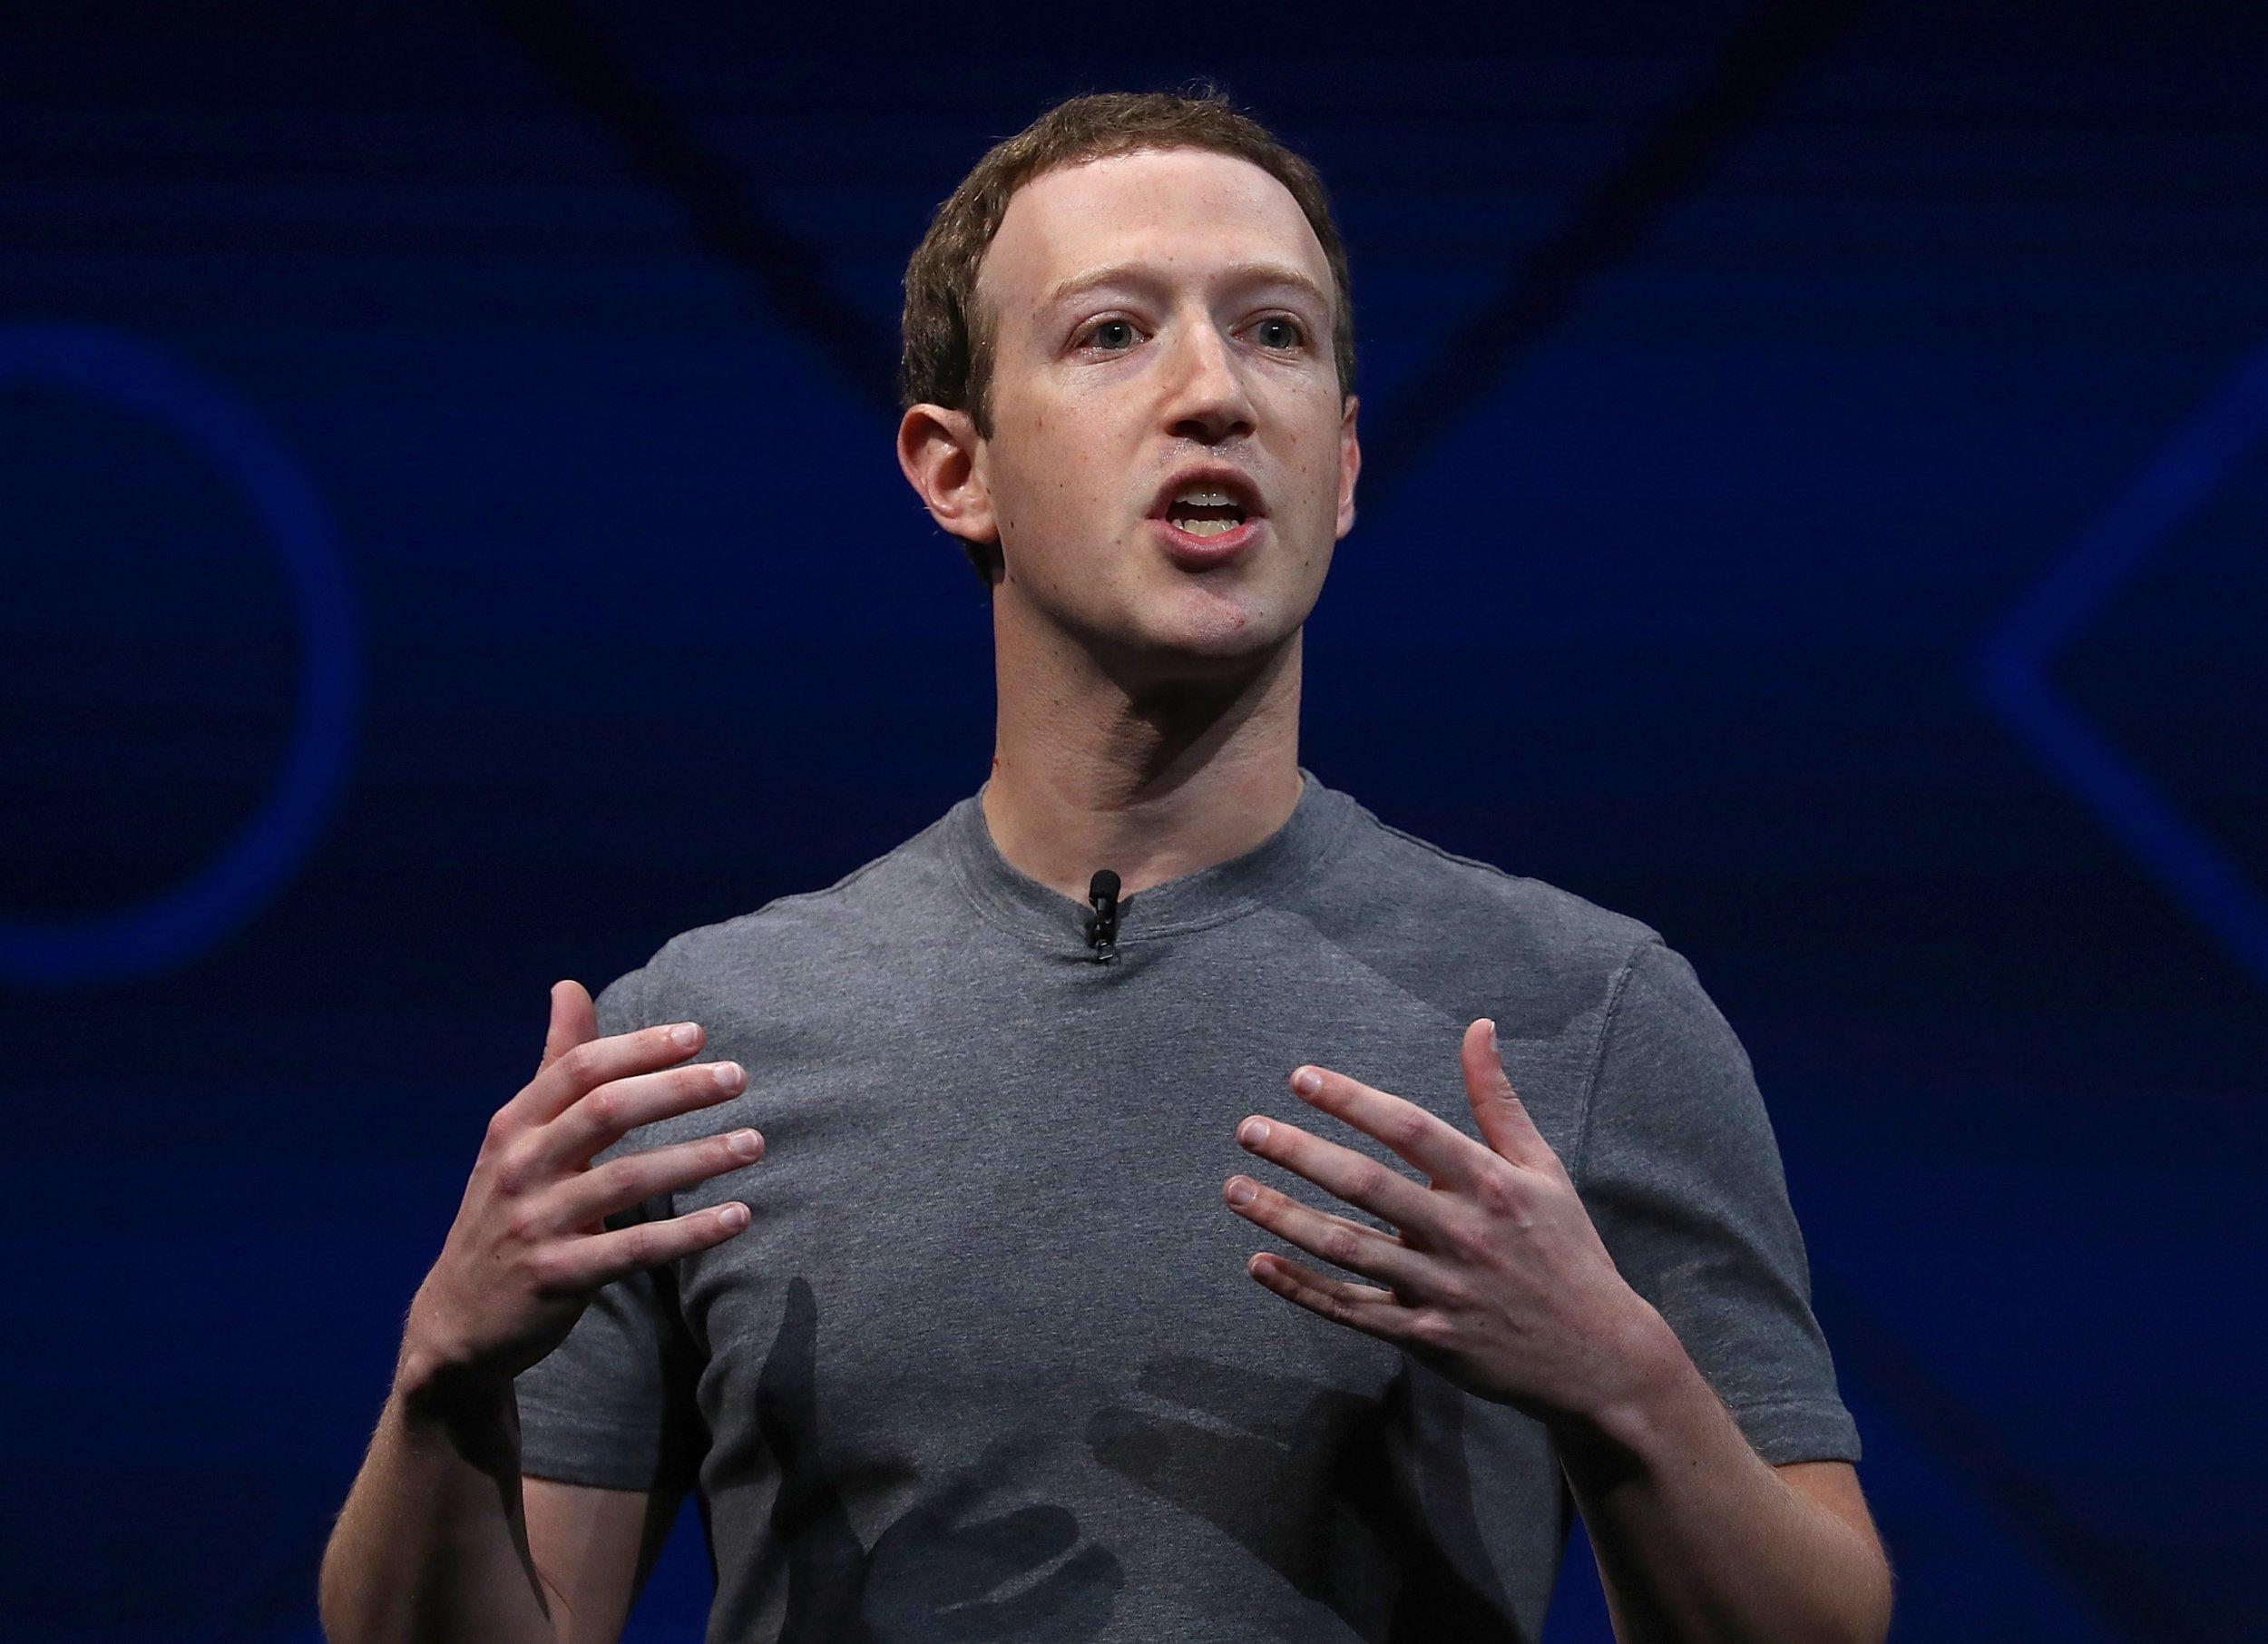 12_18_Mark_Zuckerberg_Speaking